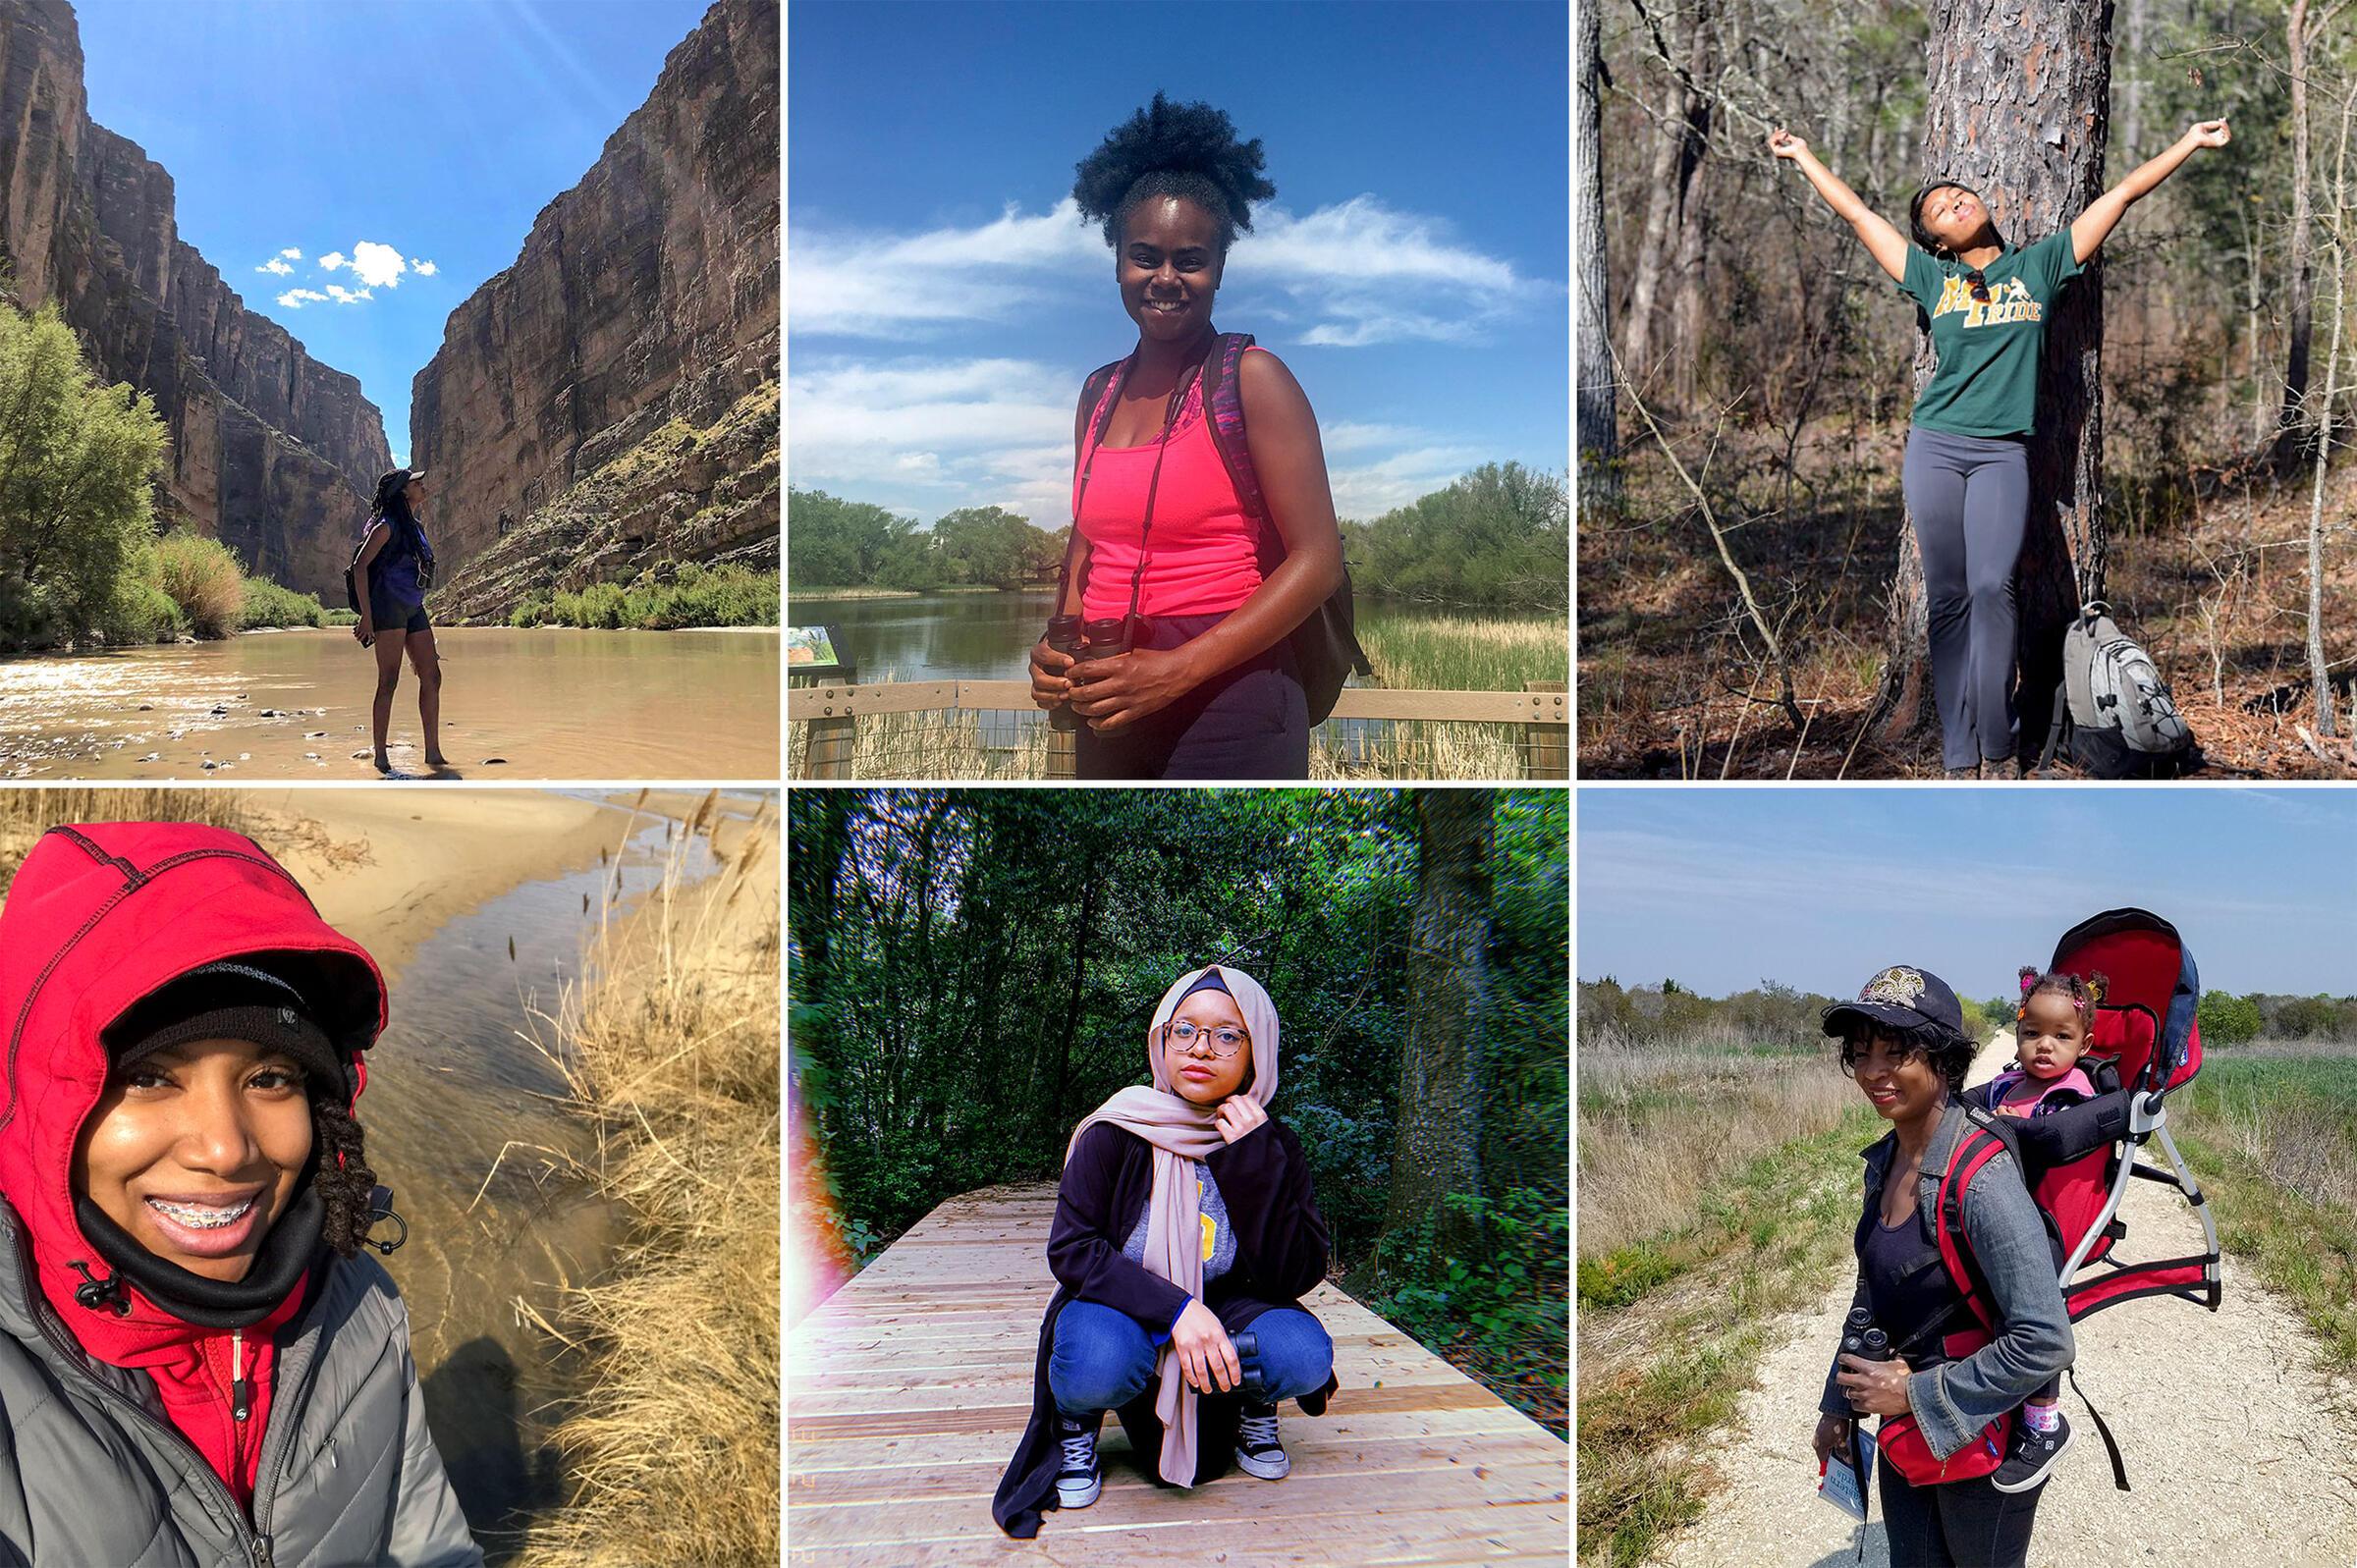 Clockwise from top left: Danielle Belleny; Joelle Jenkins; Deja Perkins; Chidi Paige; Baiyinah Abdullah; Ashley Gary.